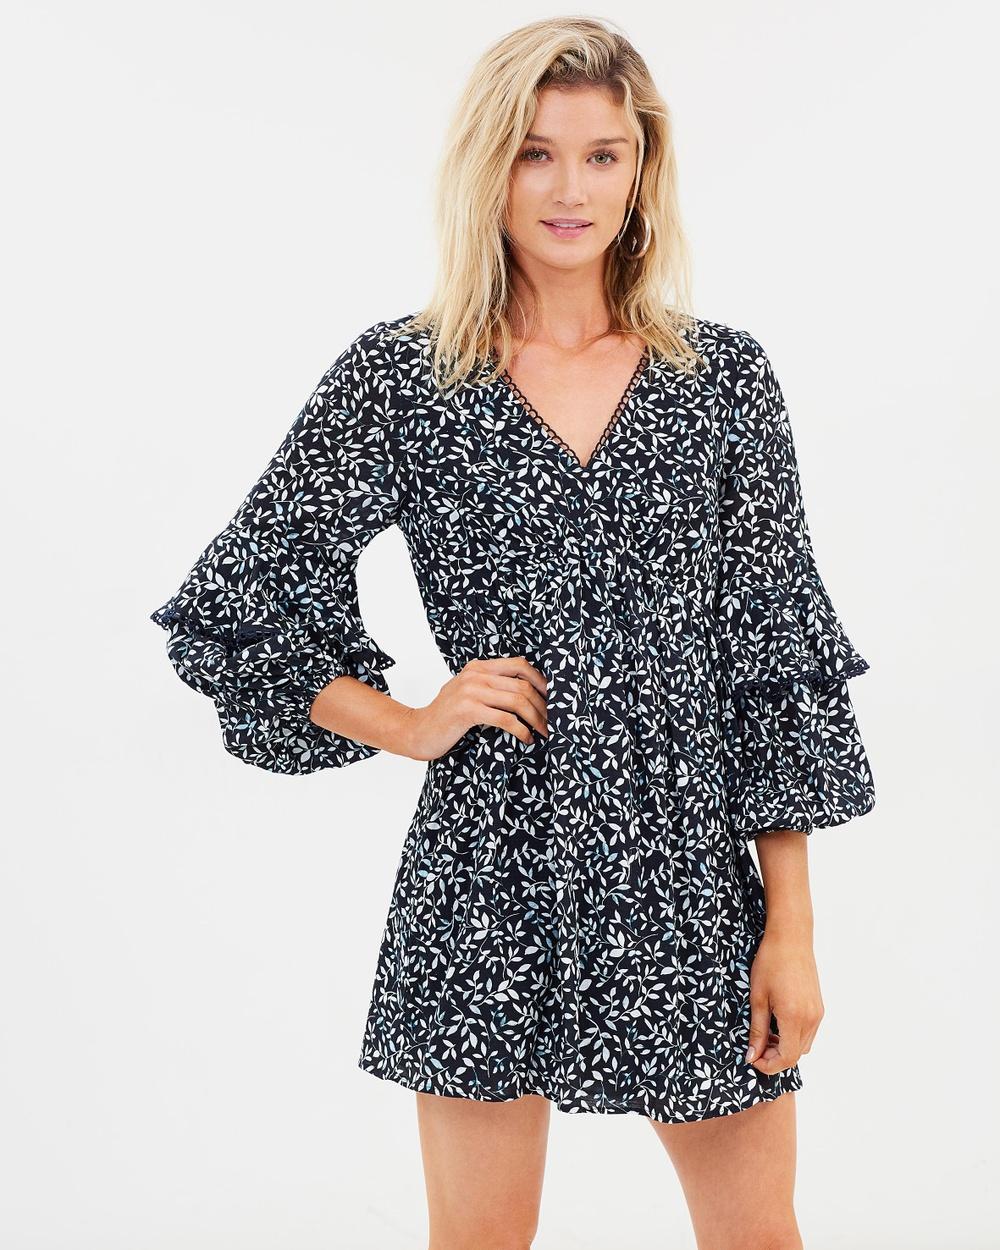 Steele Kasia Dress Printed Dresses Dark Willow Kasia Dress